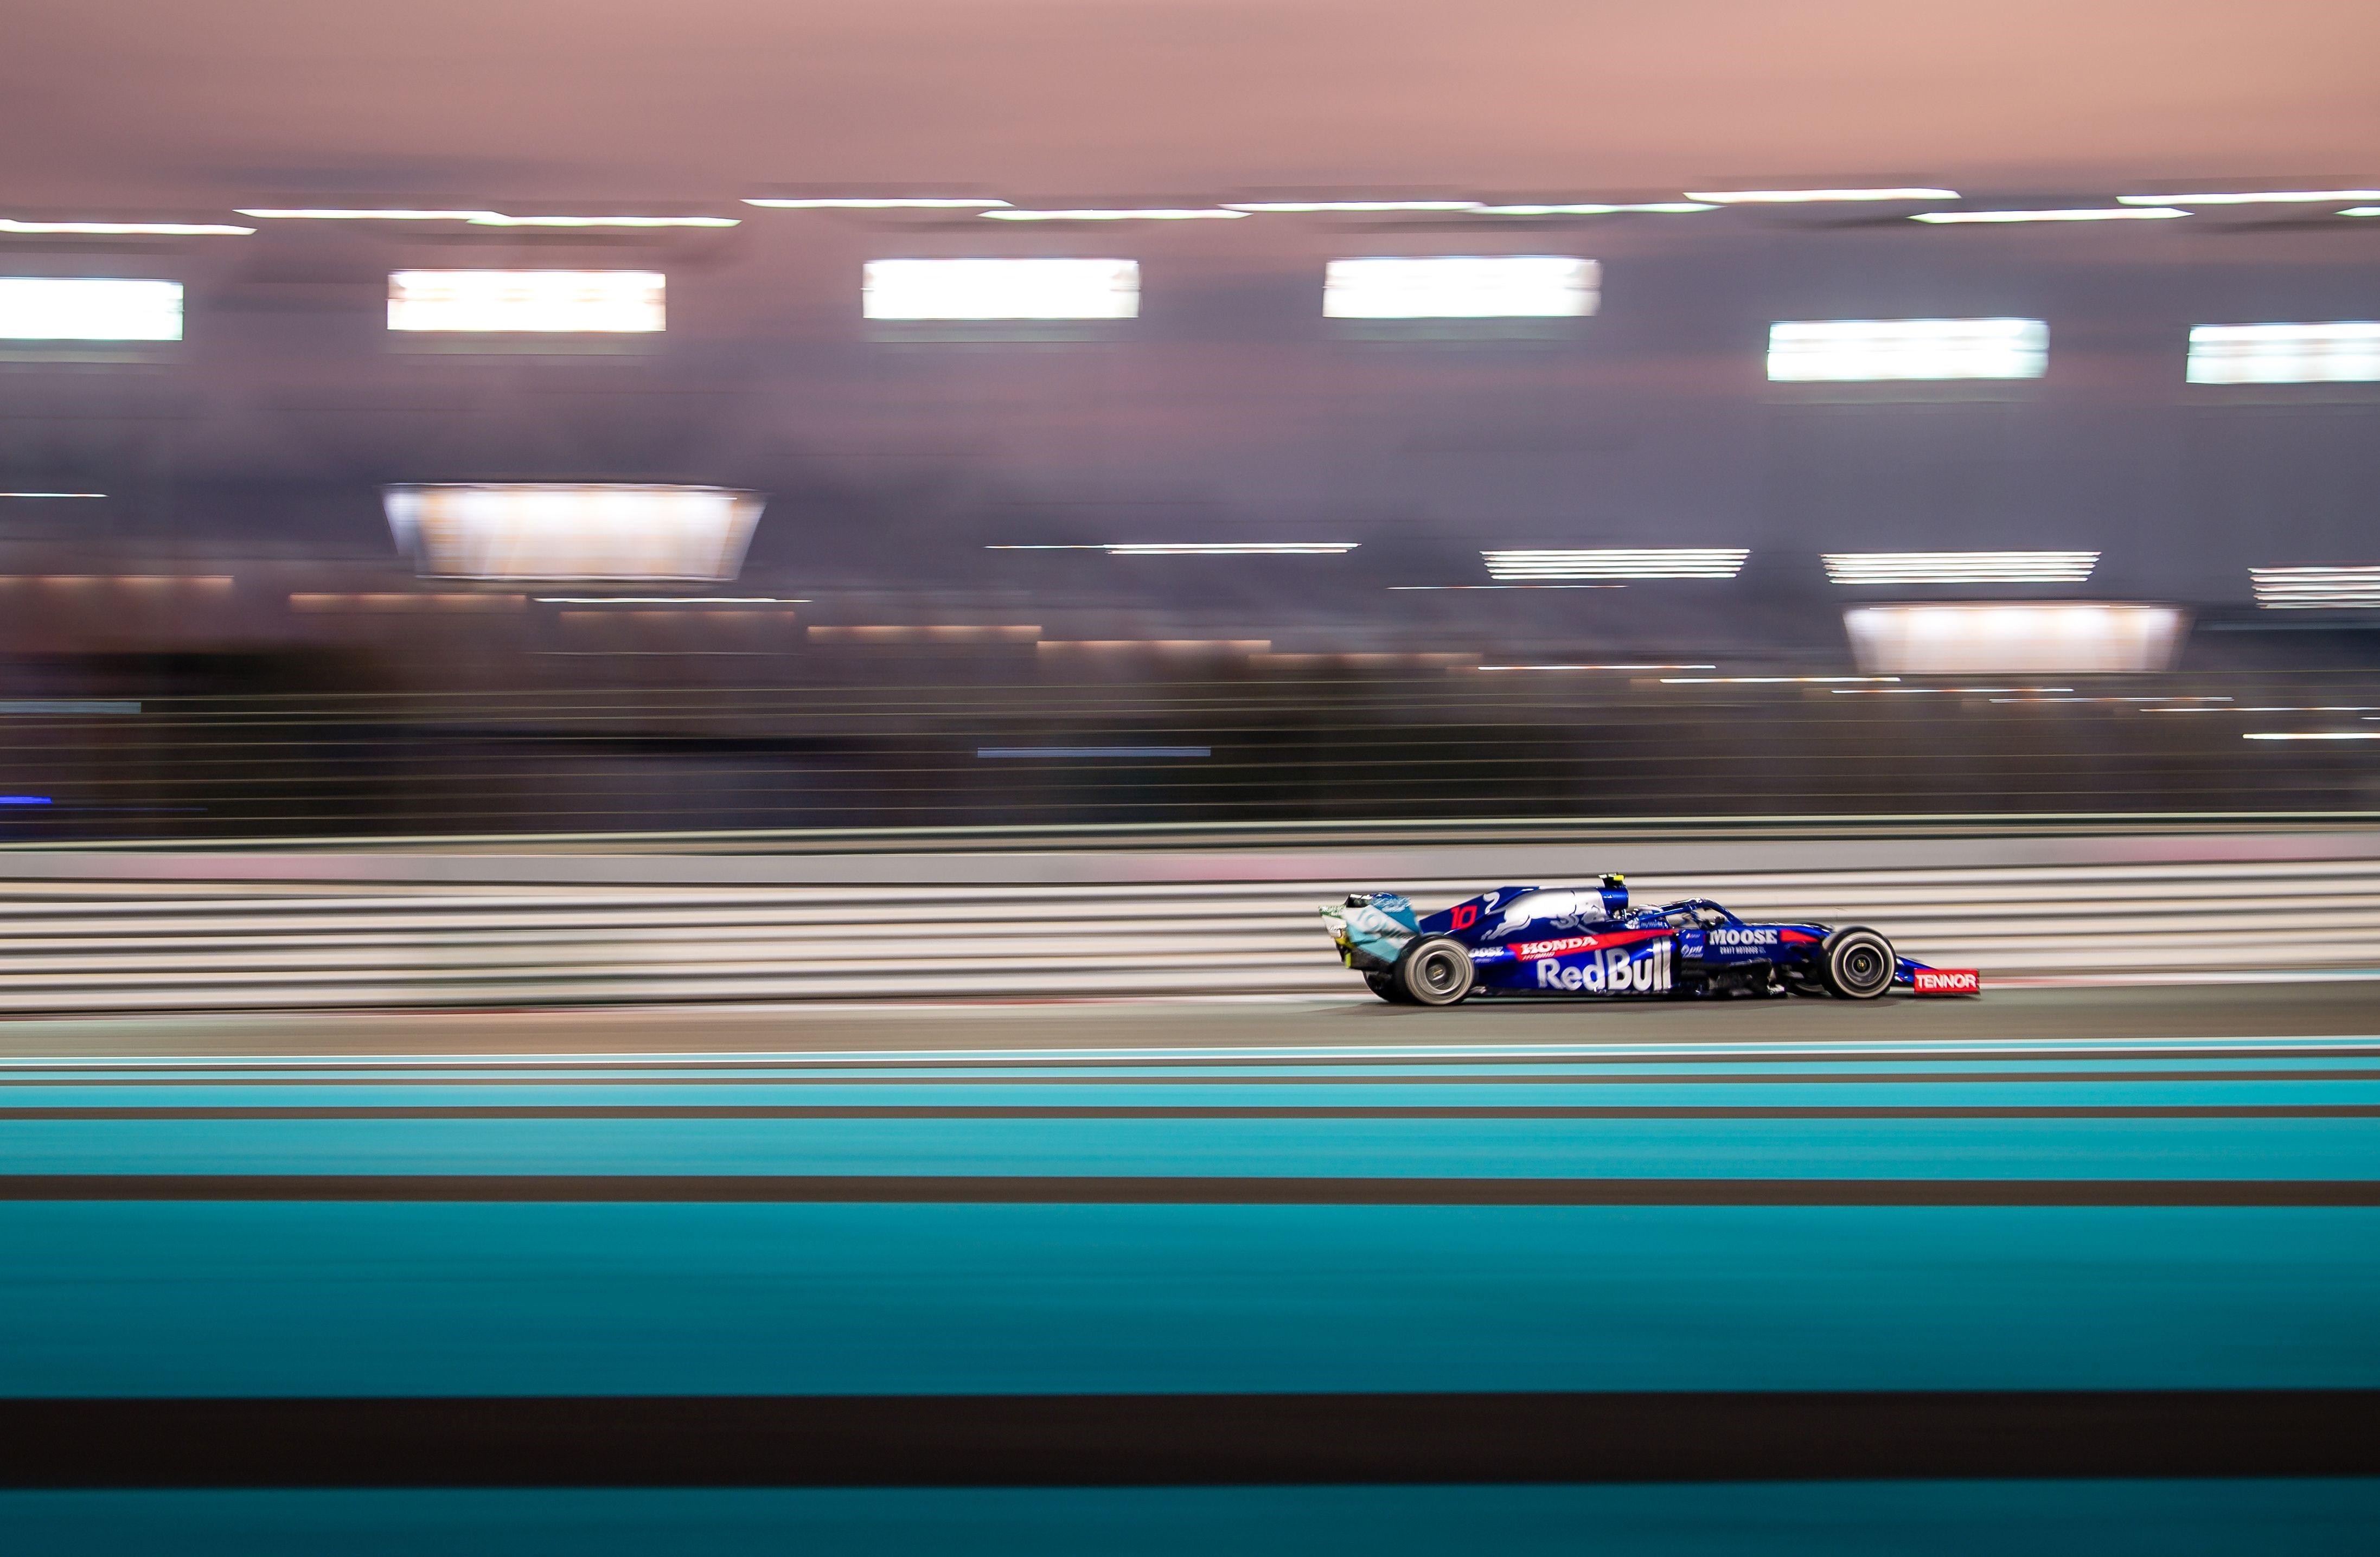 Pierre Gasly (Toro Rosso) au Grand Prix d'Abou Dabi 2019